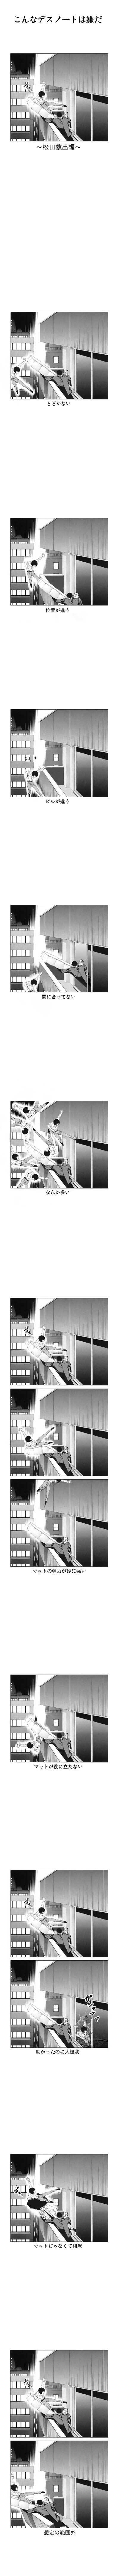 deathnote-matsuda-building